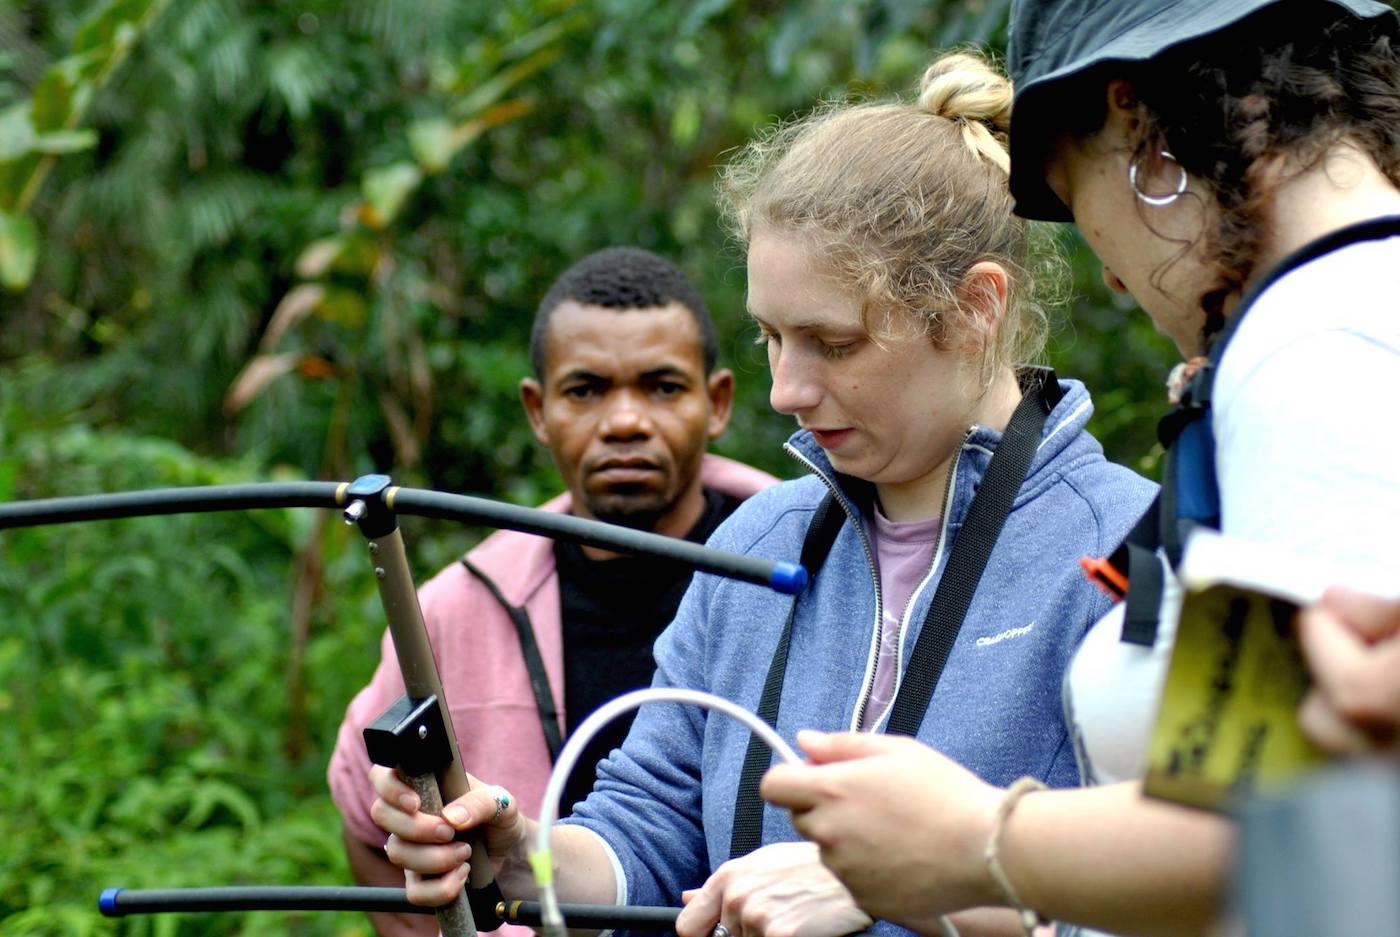 La dottoranda Rachel Sawyer in Madagascar insieme alla guida Laviky - foto Silvia Battisti